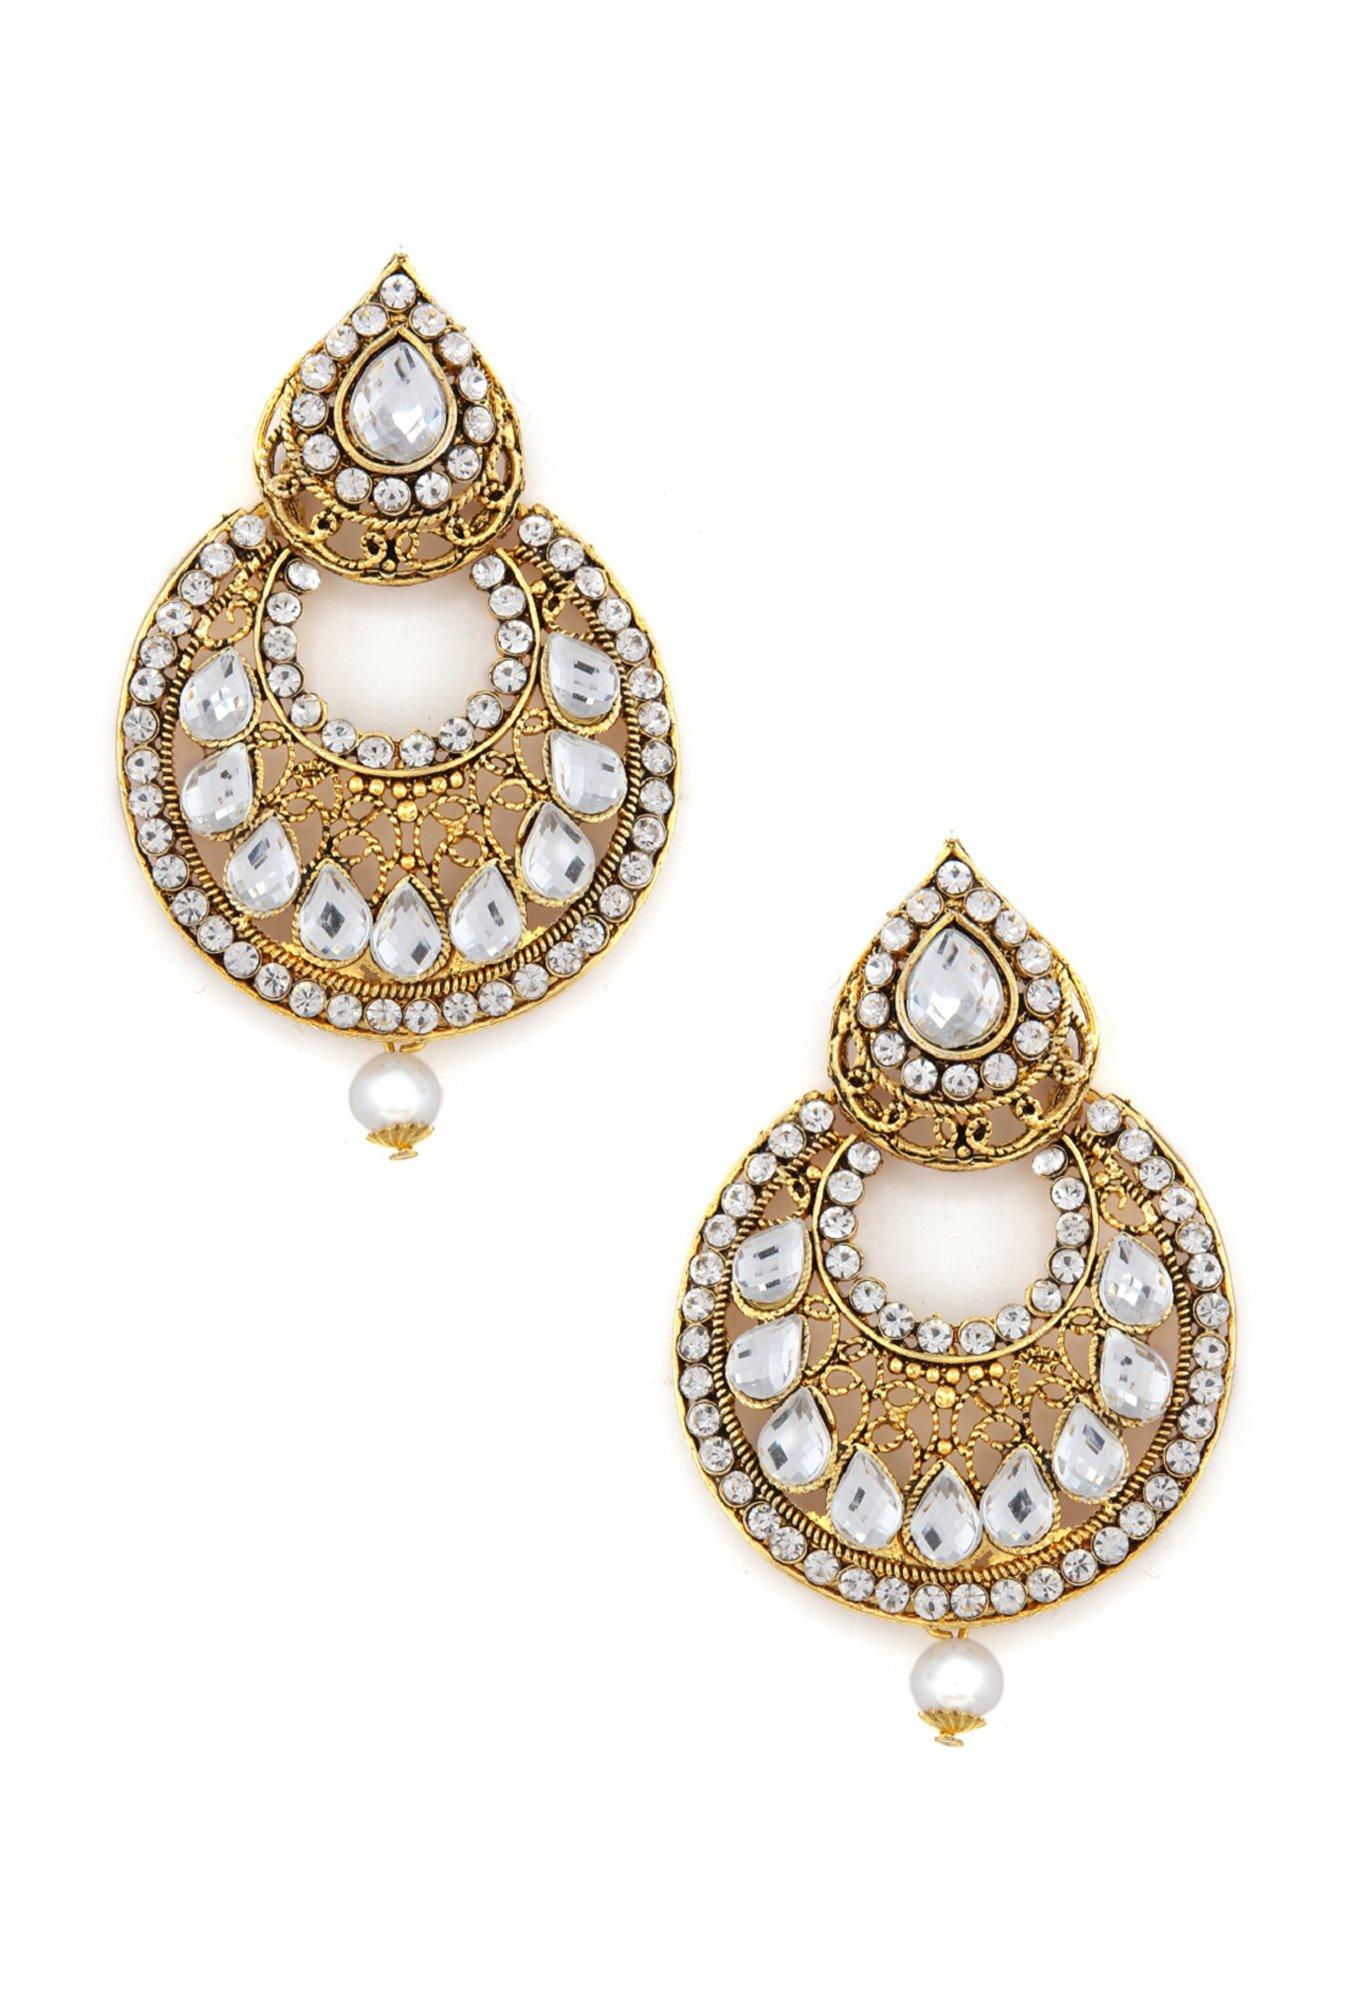 Buy Rubans Polki Golden Metal Chand Bali Earrings Online At Best